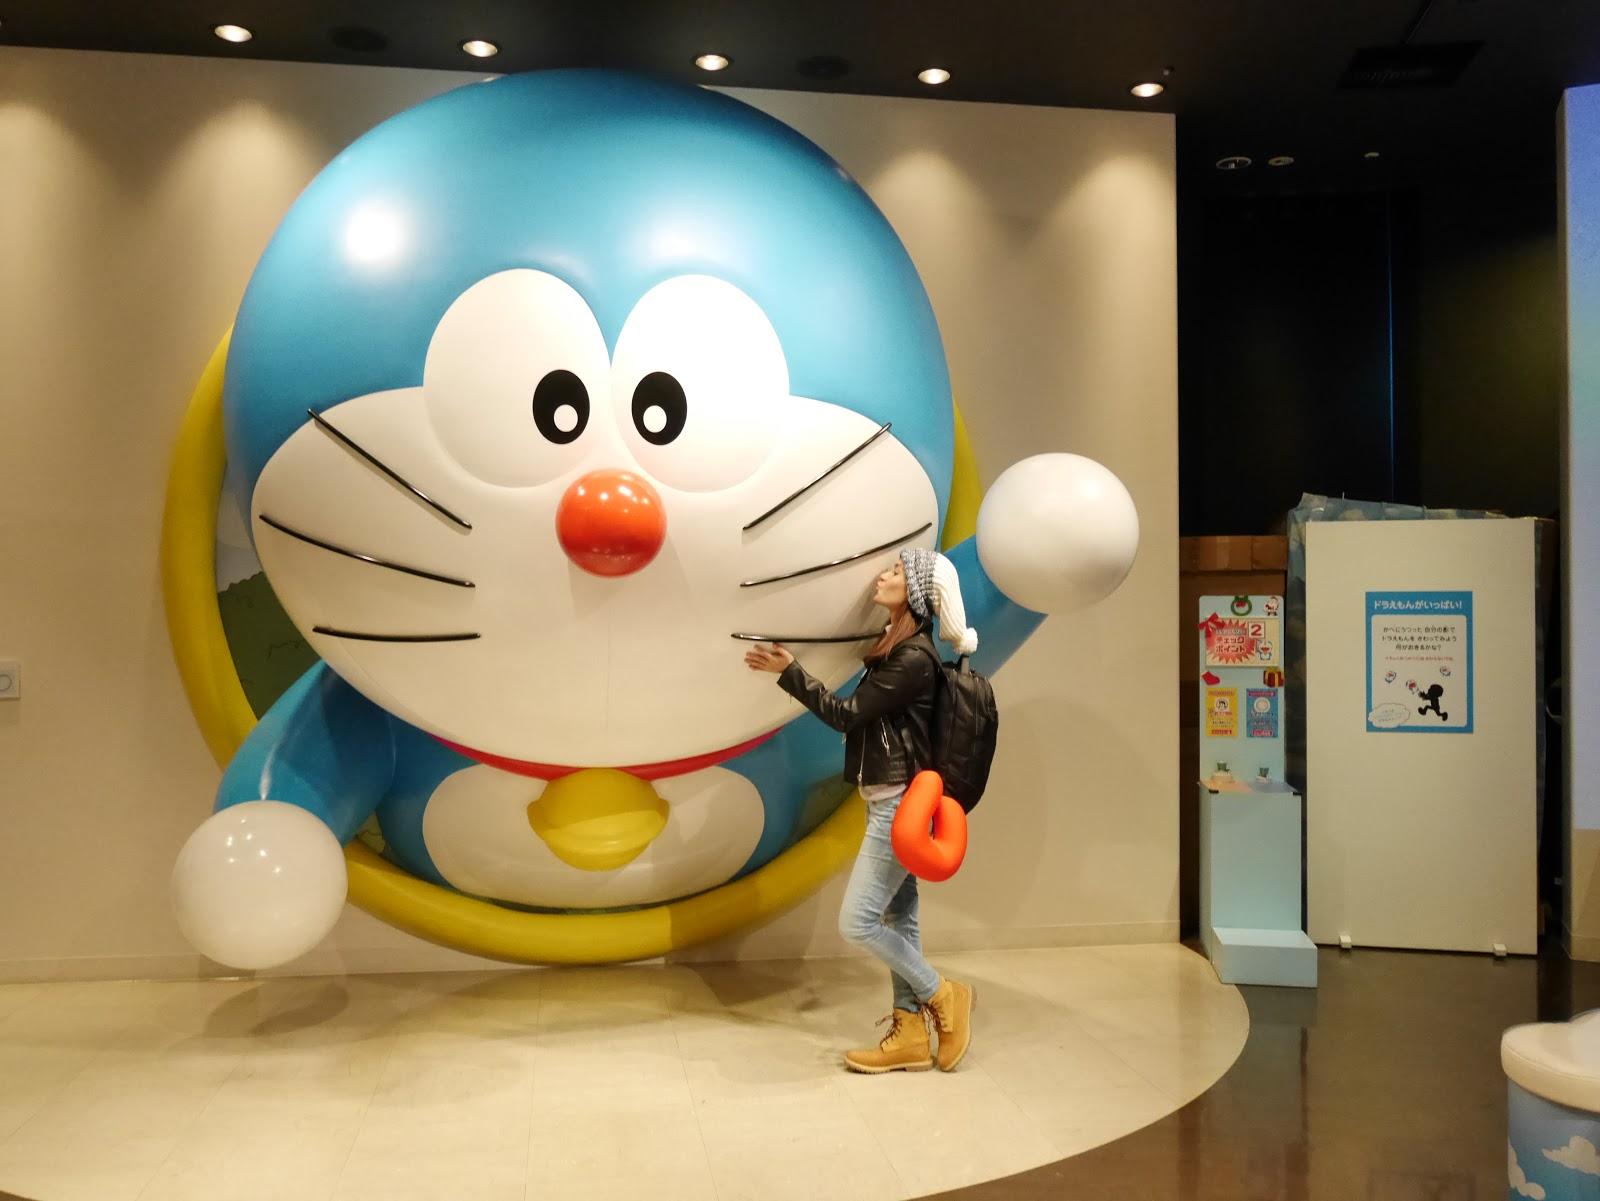 Entry Bergambar Hokkaido Day 1 Media Panas Tcash Vaganza 18 Nabi Matte Long Lasting Lip Gloss Ni Entrance Nak Masuk Doraemon Wakuwaru Skyparkmuka Very Welcoming Gitu